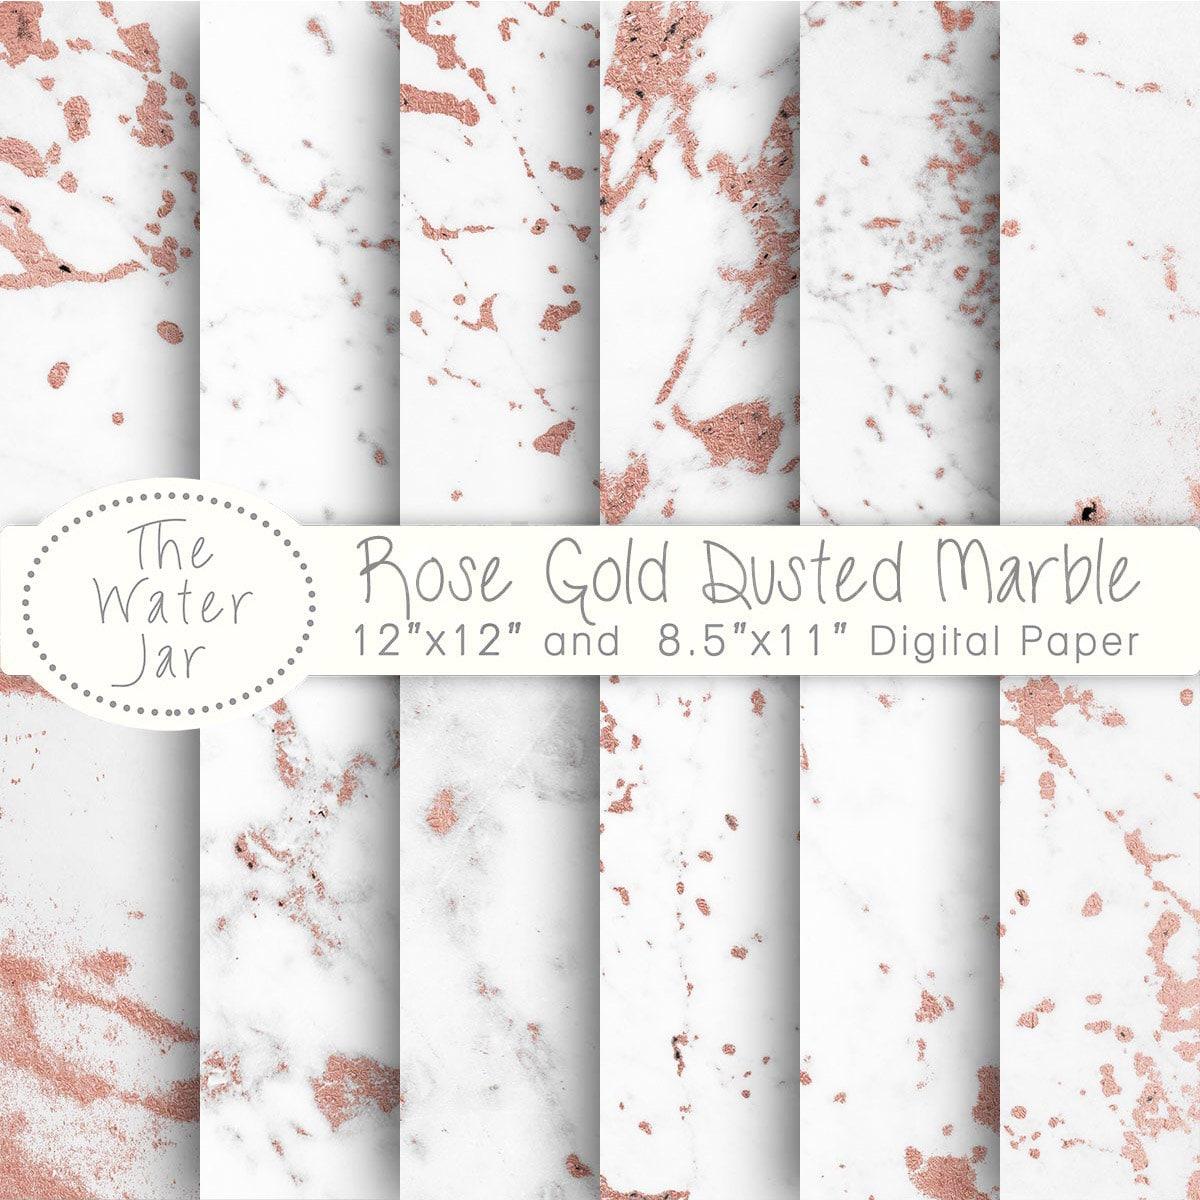 Top Wallpaper Marble Case - il_fullxfull  HD_1739100.jpg?version\u003d1